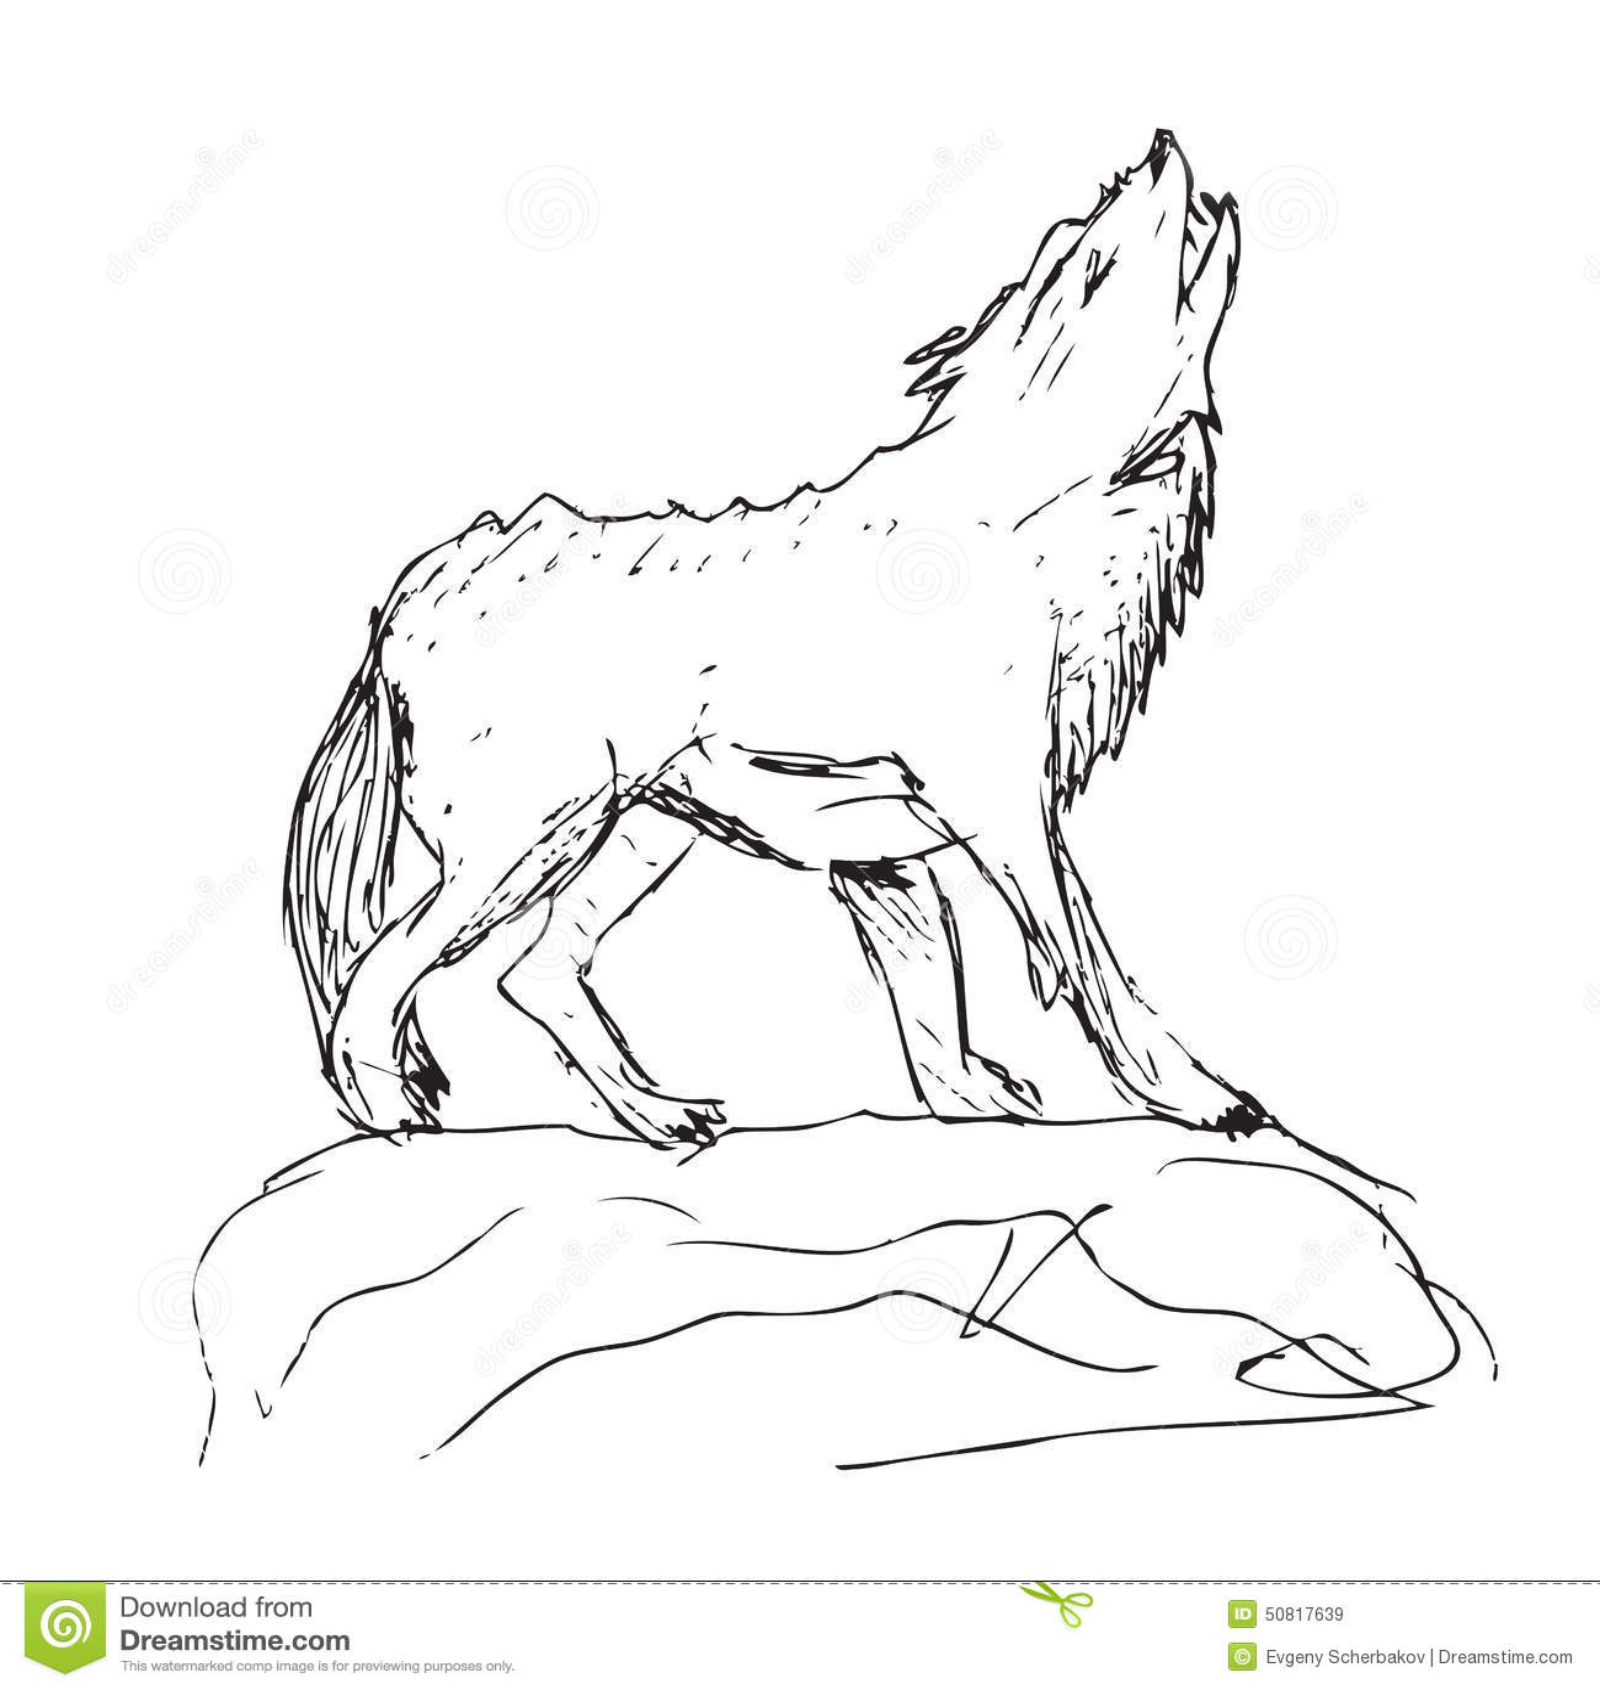 Dessin d 39 un grand loup illustration stock image 50817639 - Image loup dessin ...